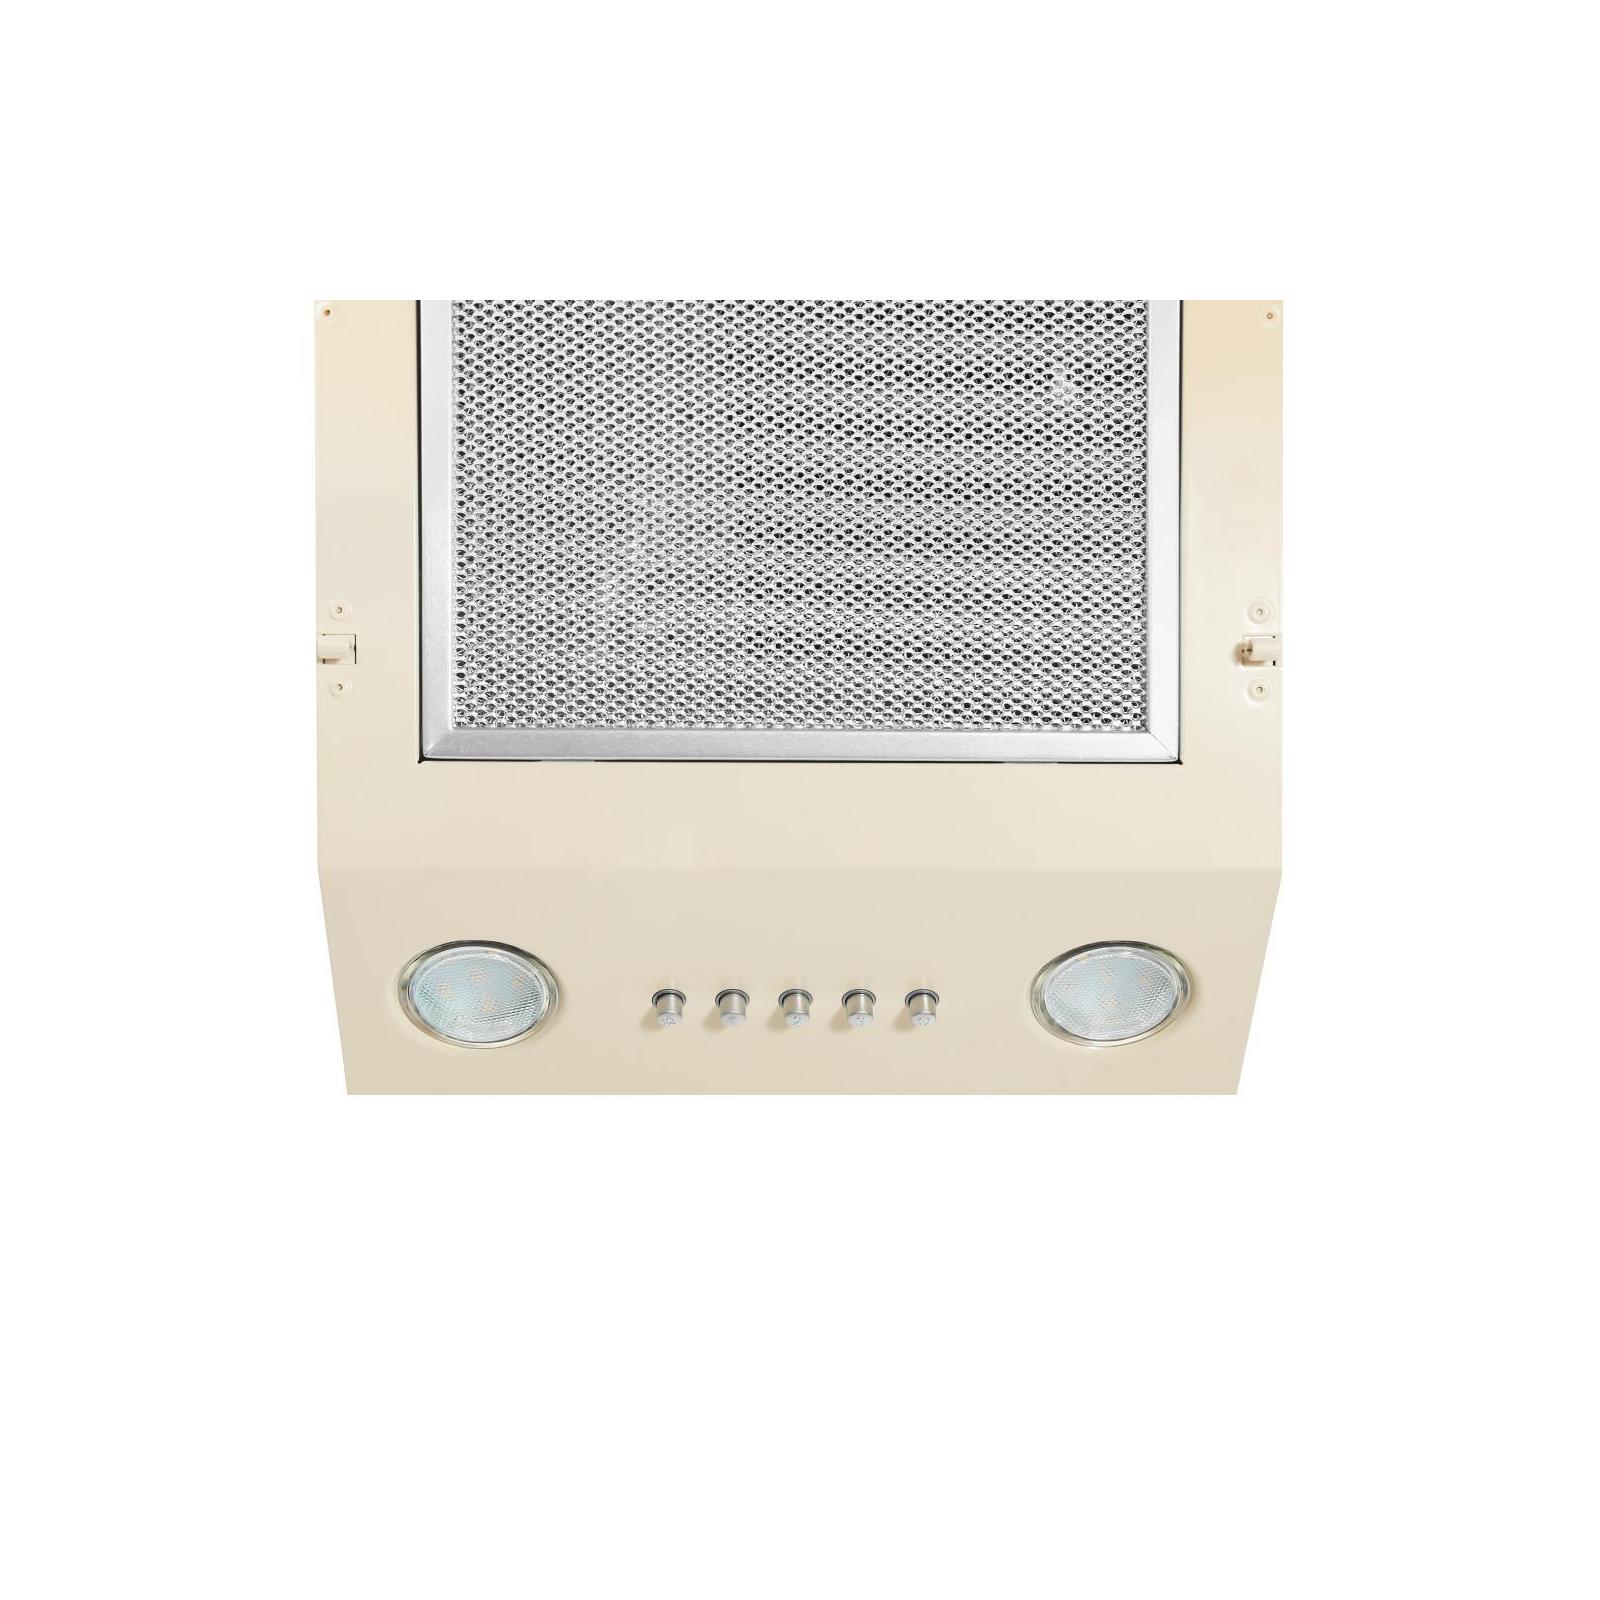 Вытяжка кухонная PERFELLI DN 6642 A 1000 IV LED изображение 4